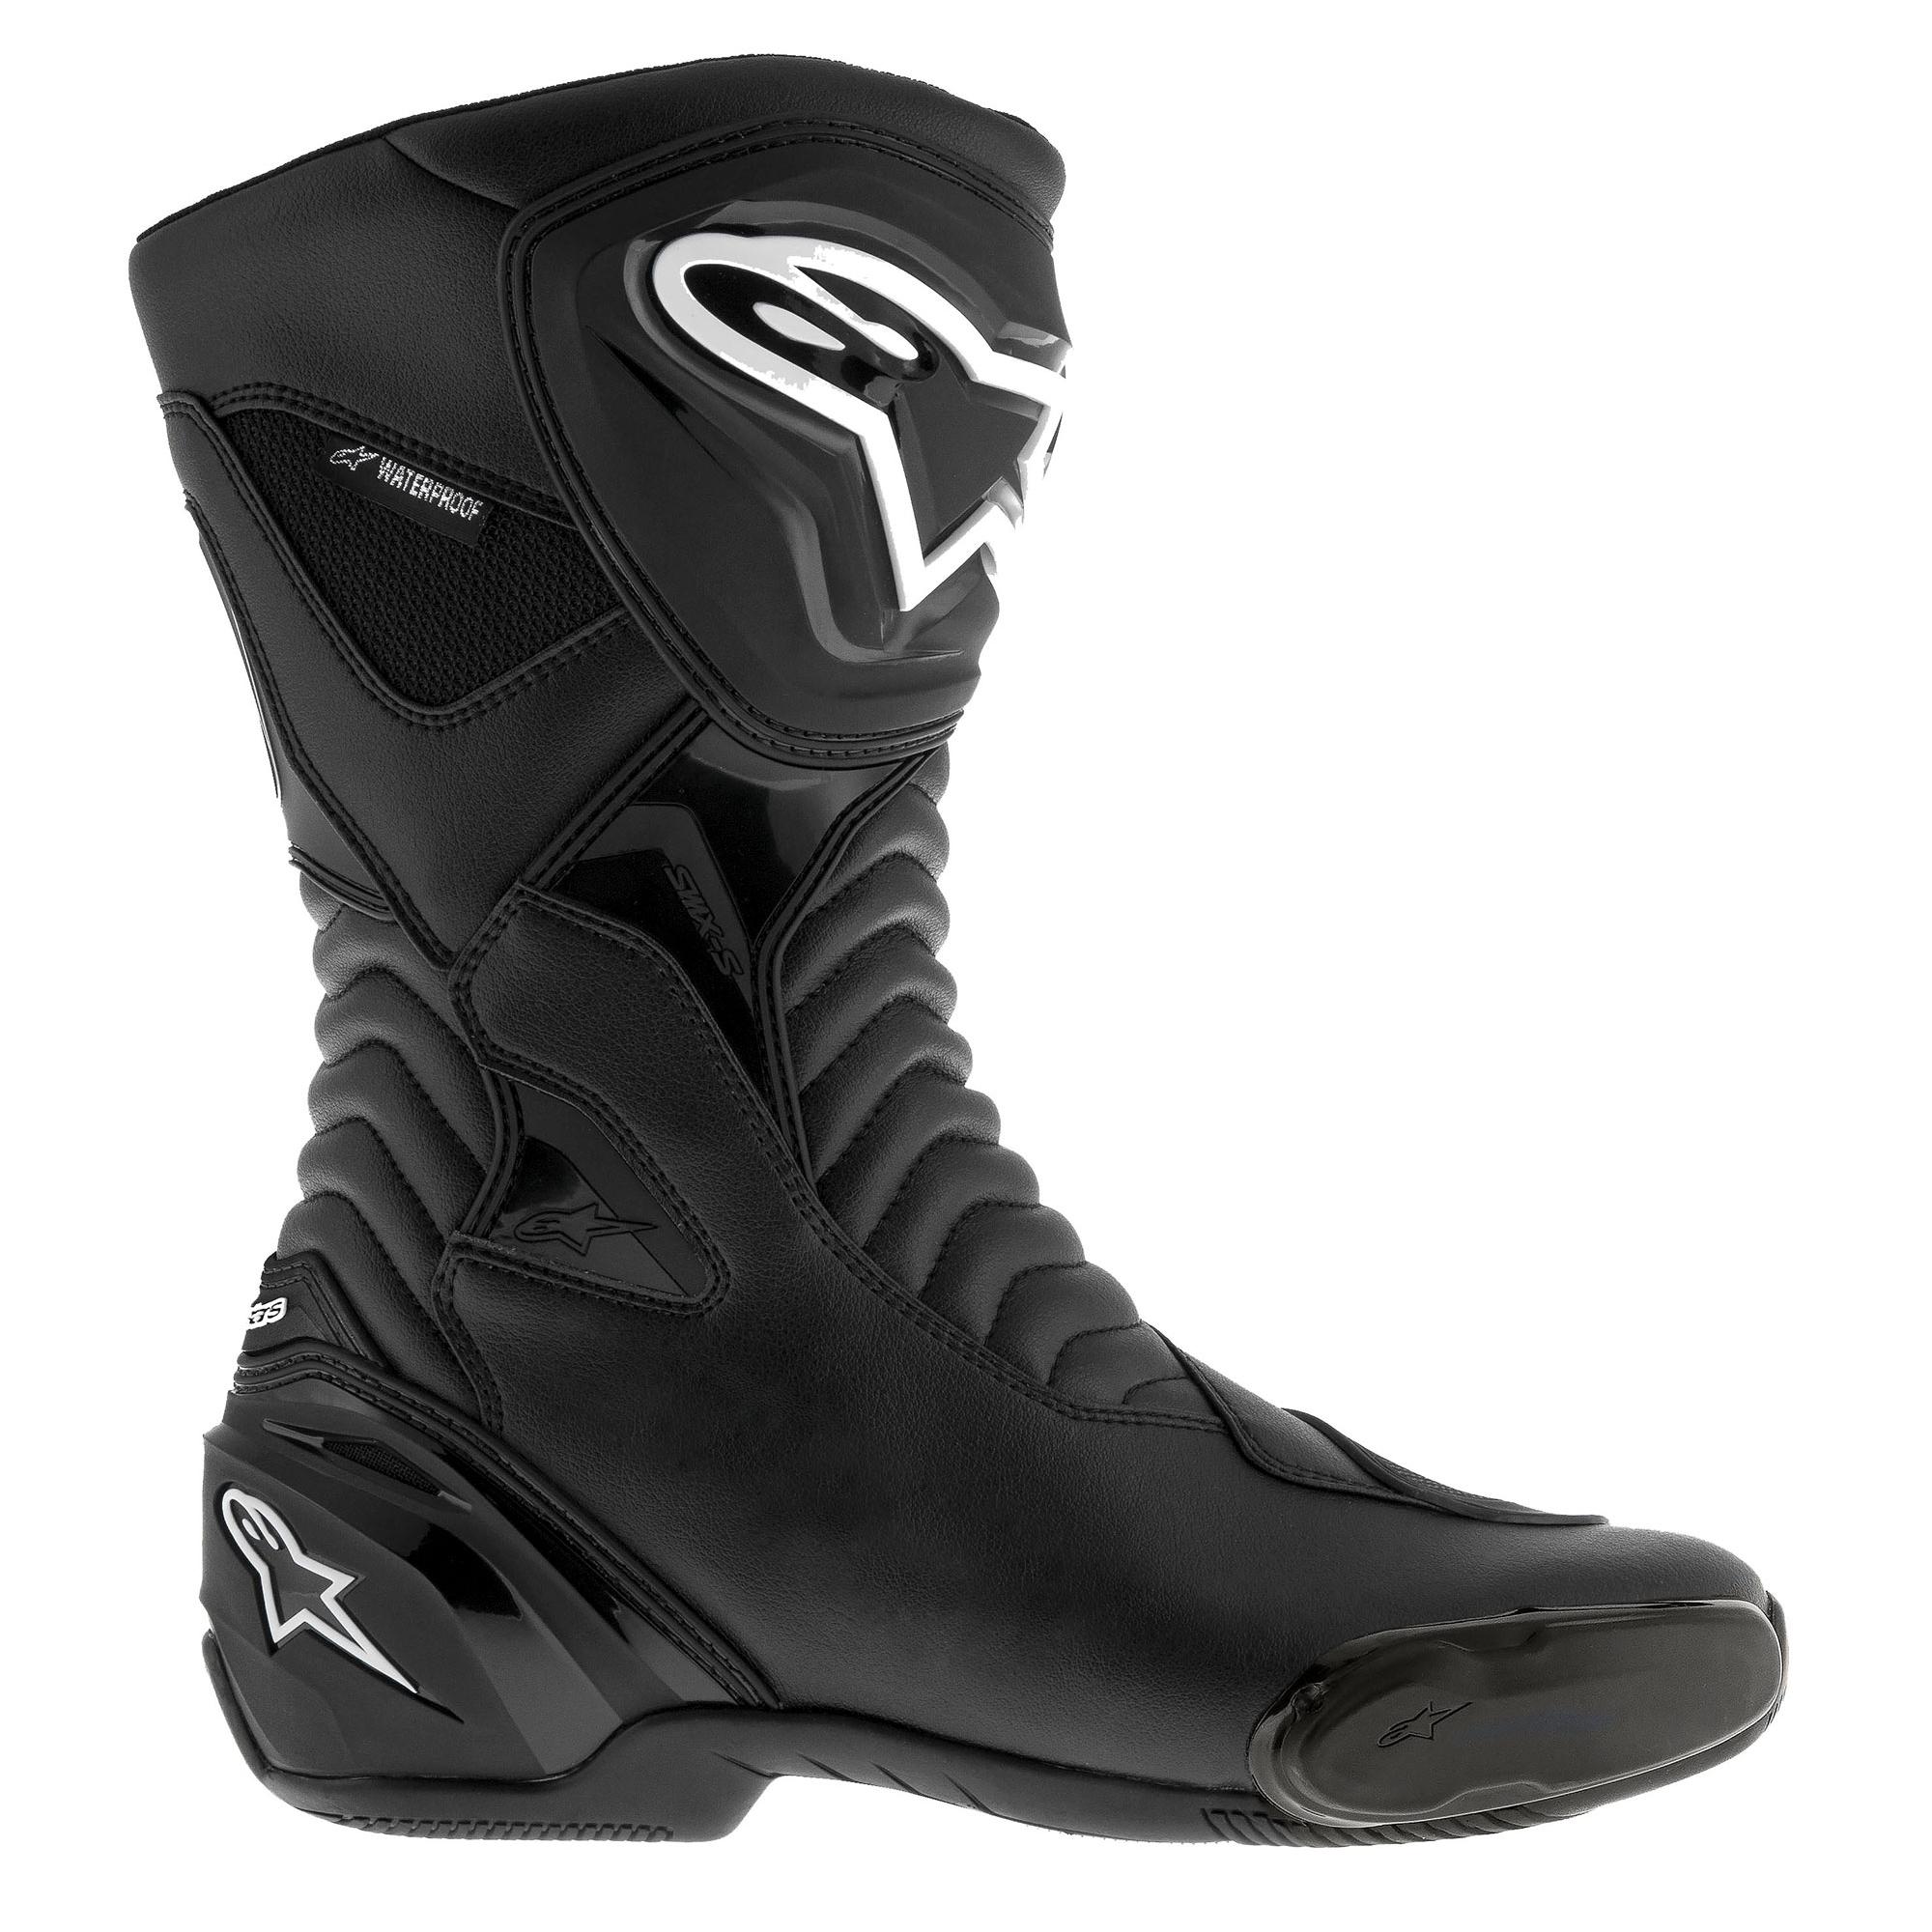 467e7a17dec Details about Alpinestars SMX S Waterproof Motorcycle/Bike/Motorbike Riding  Boots - Black